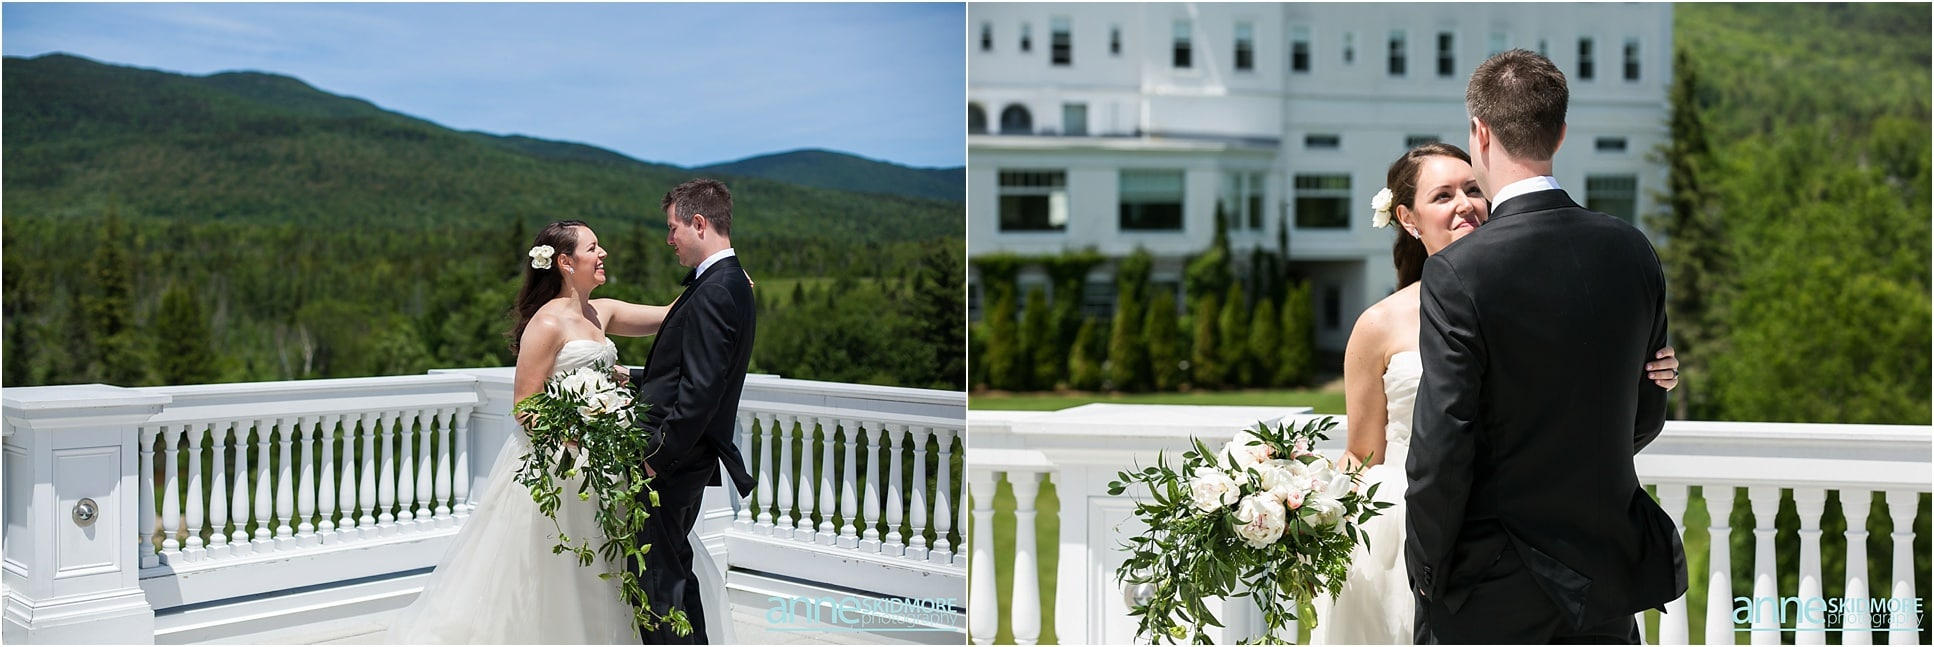 Omni_Mount_Washington_Wedding_0013